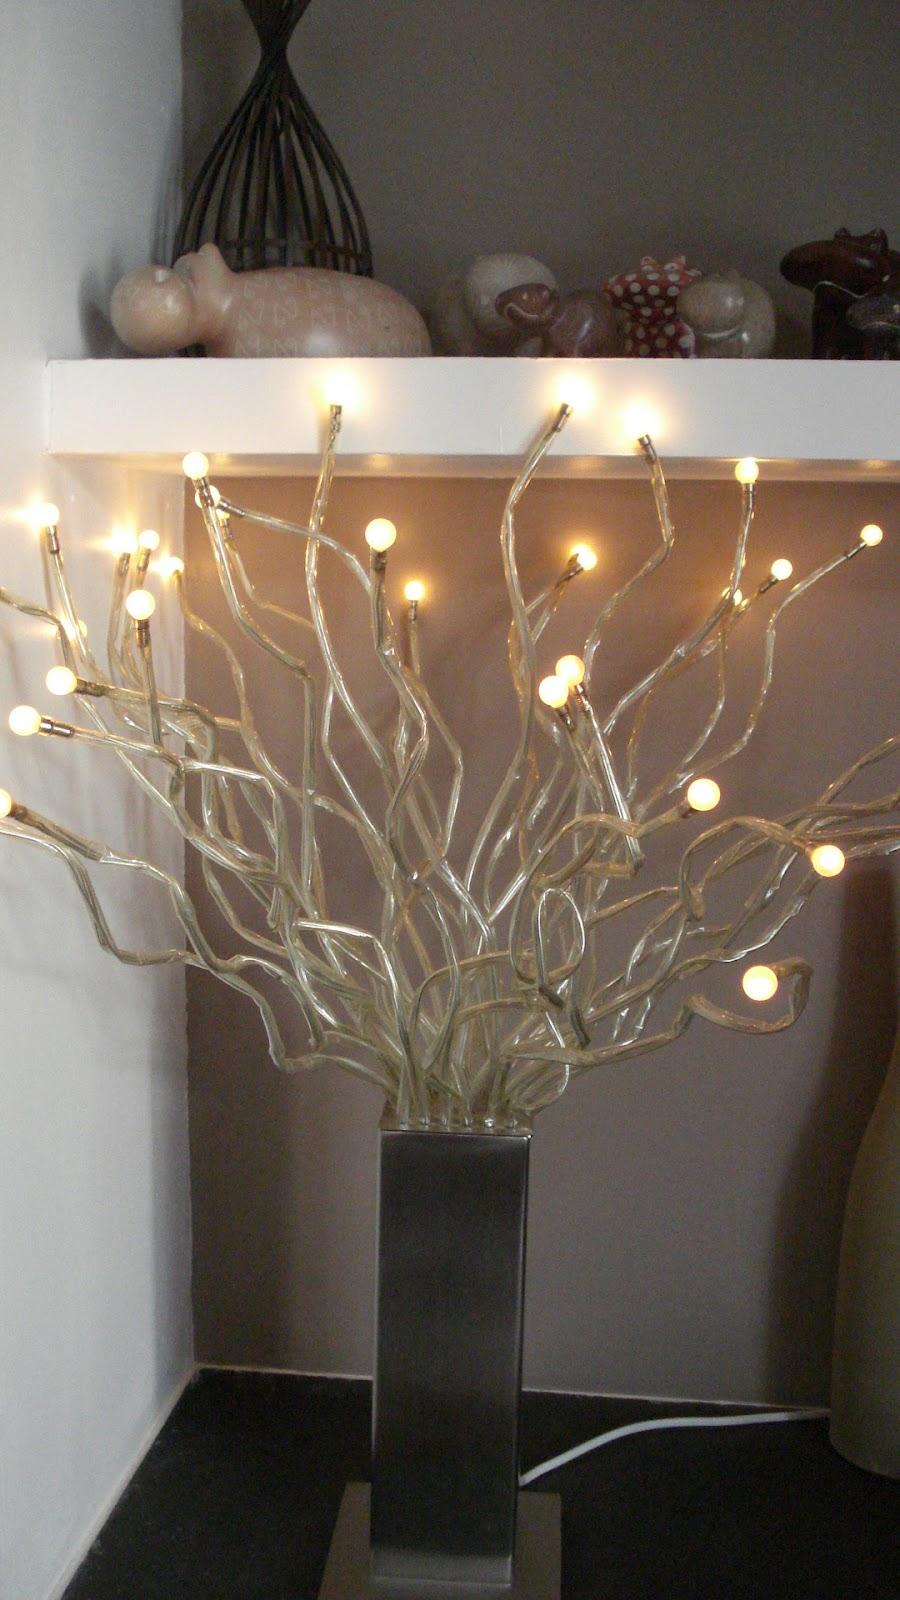 nini vide sa maison vendue lampe de salon ikea. Black Bedroom Furniture Sets. Home Design Ideas